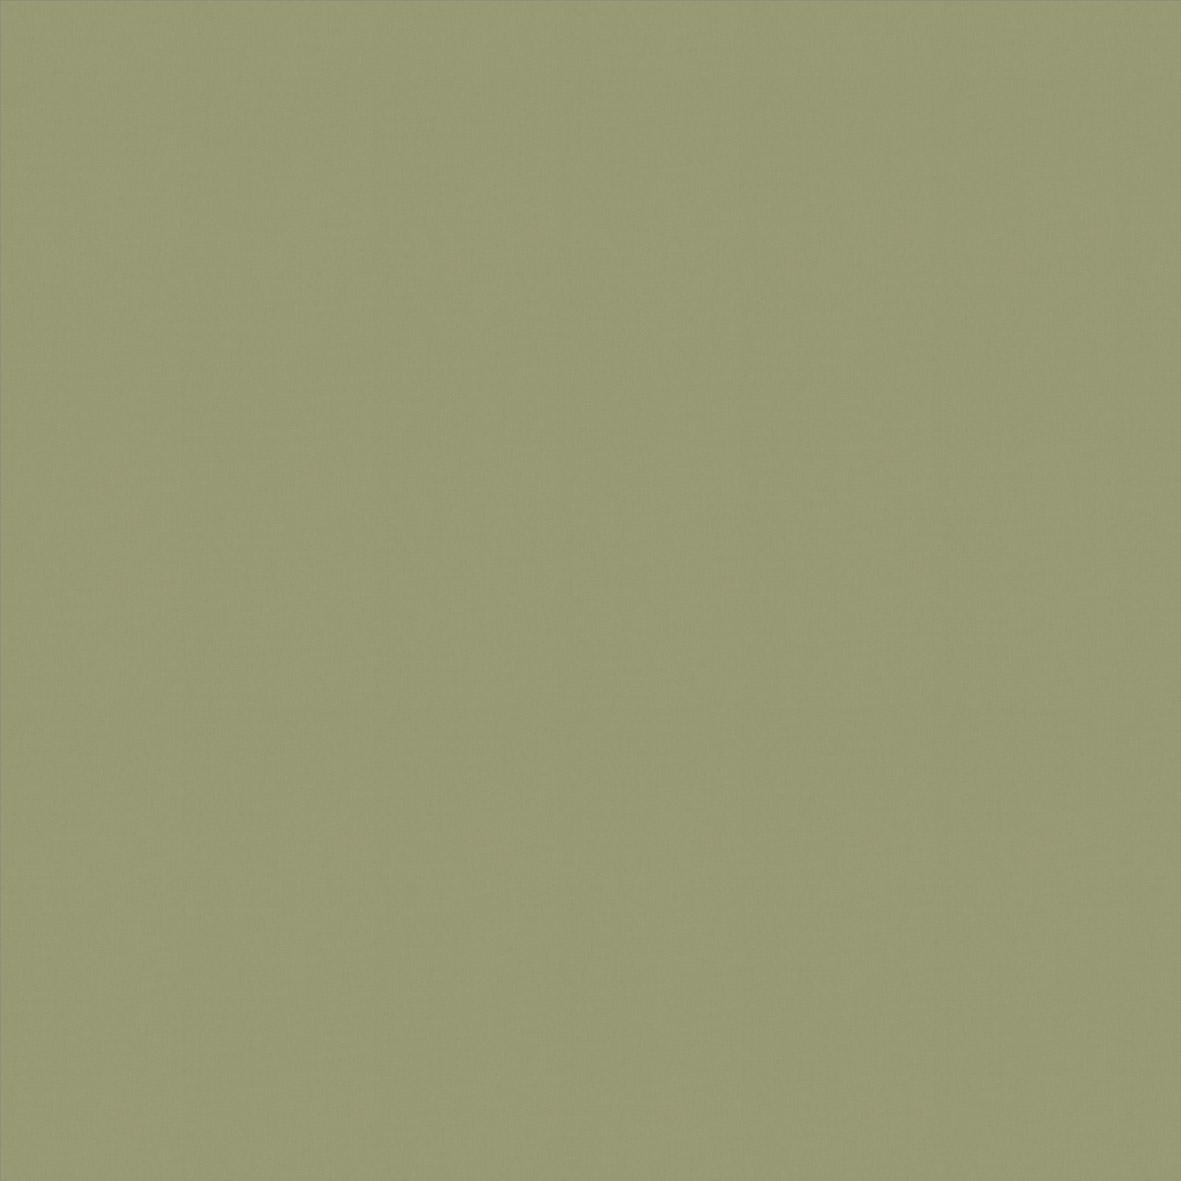 Roller_Swatch_Palette_Green_RE0005